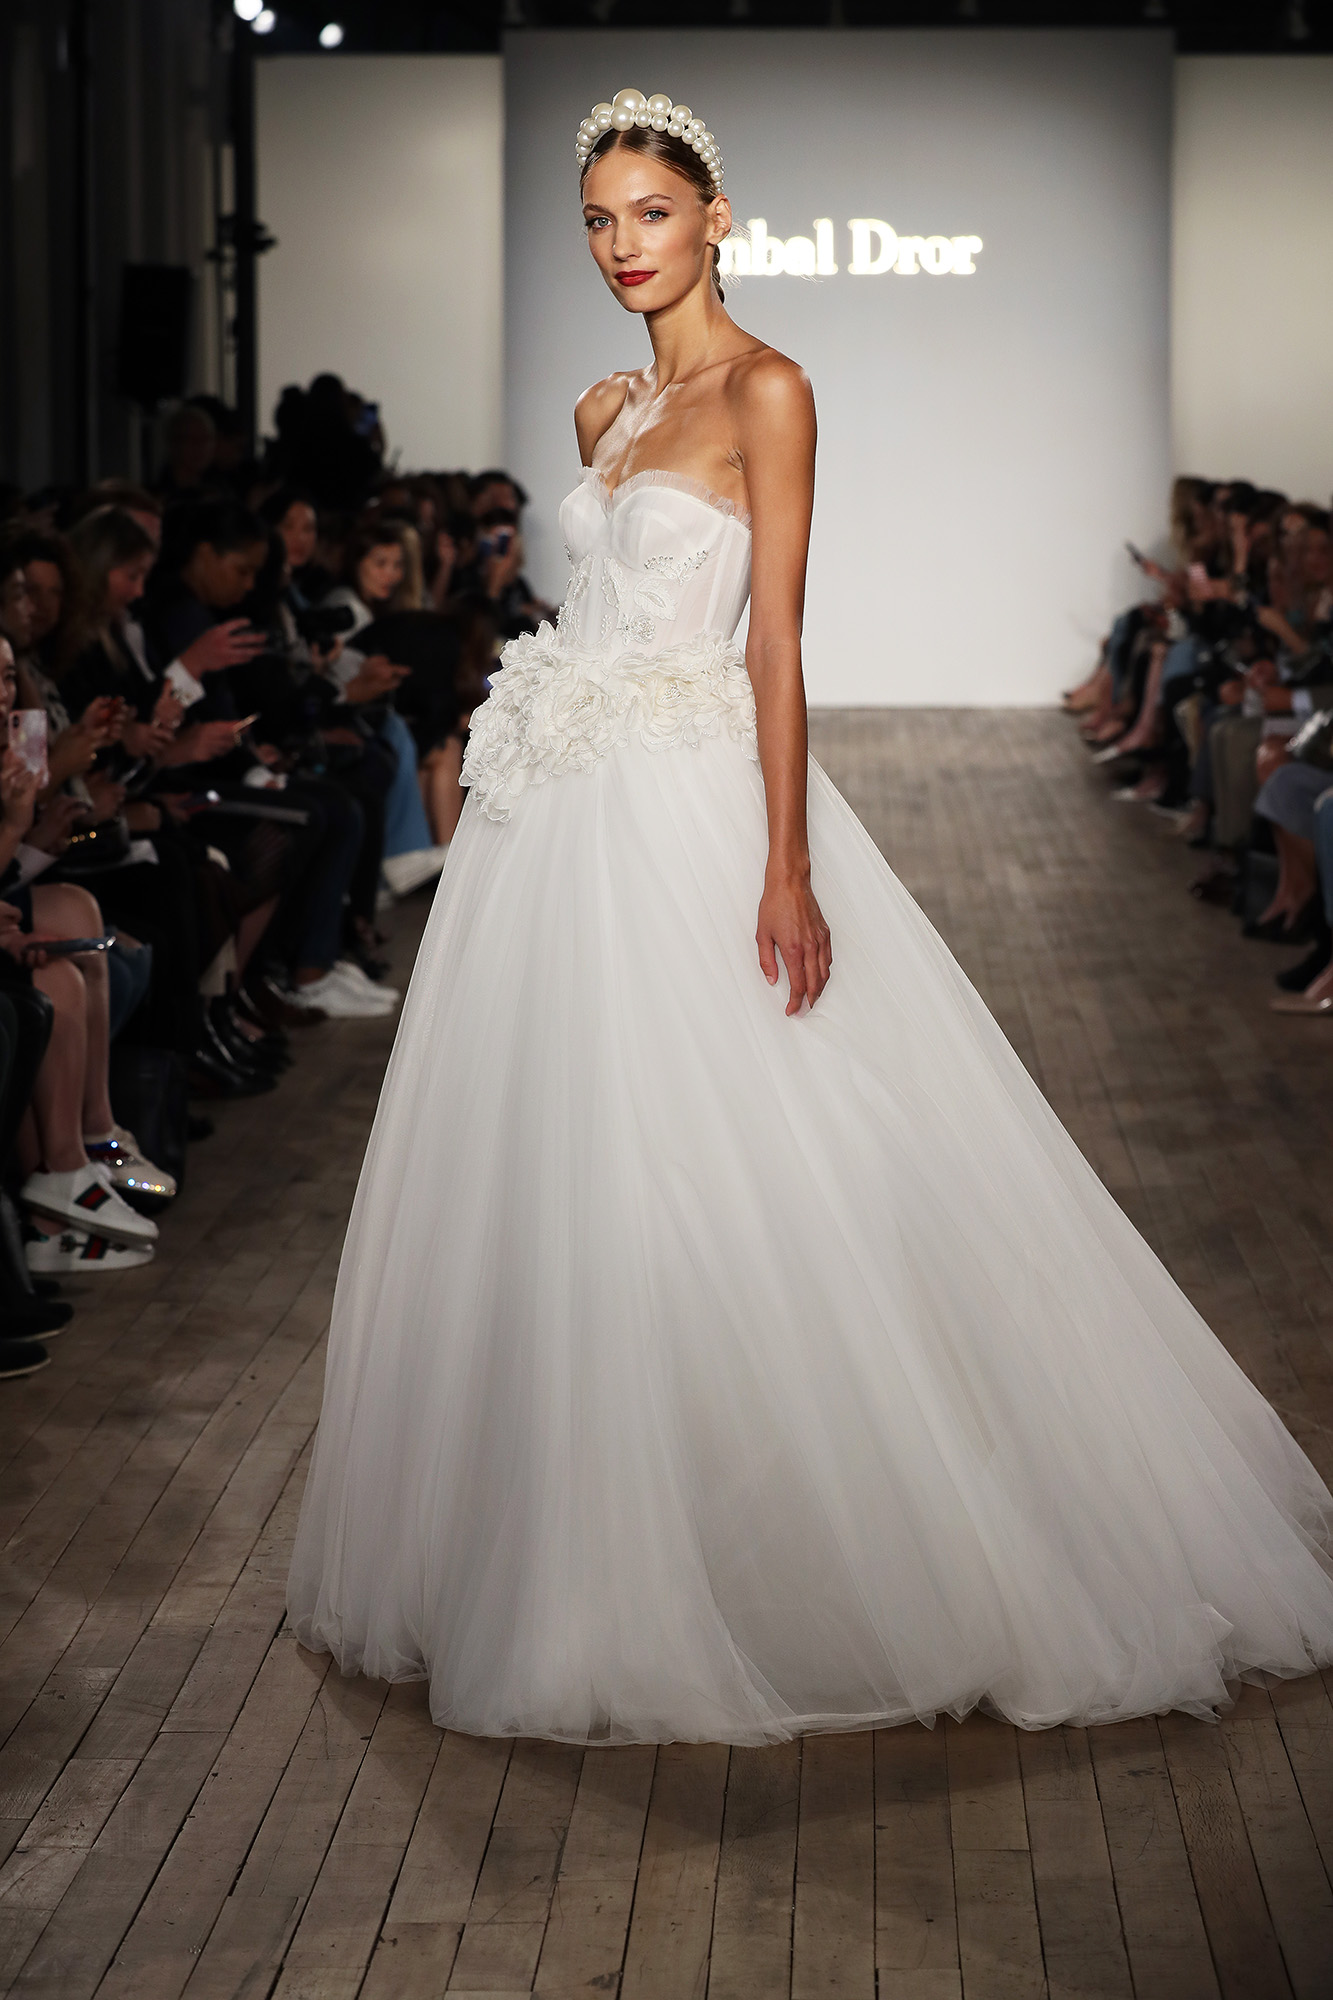 inbal dror wedding dress ball gown with applique flowers at waist